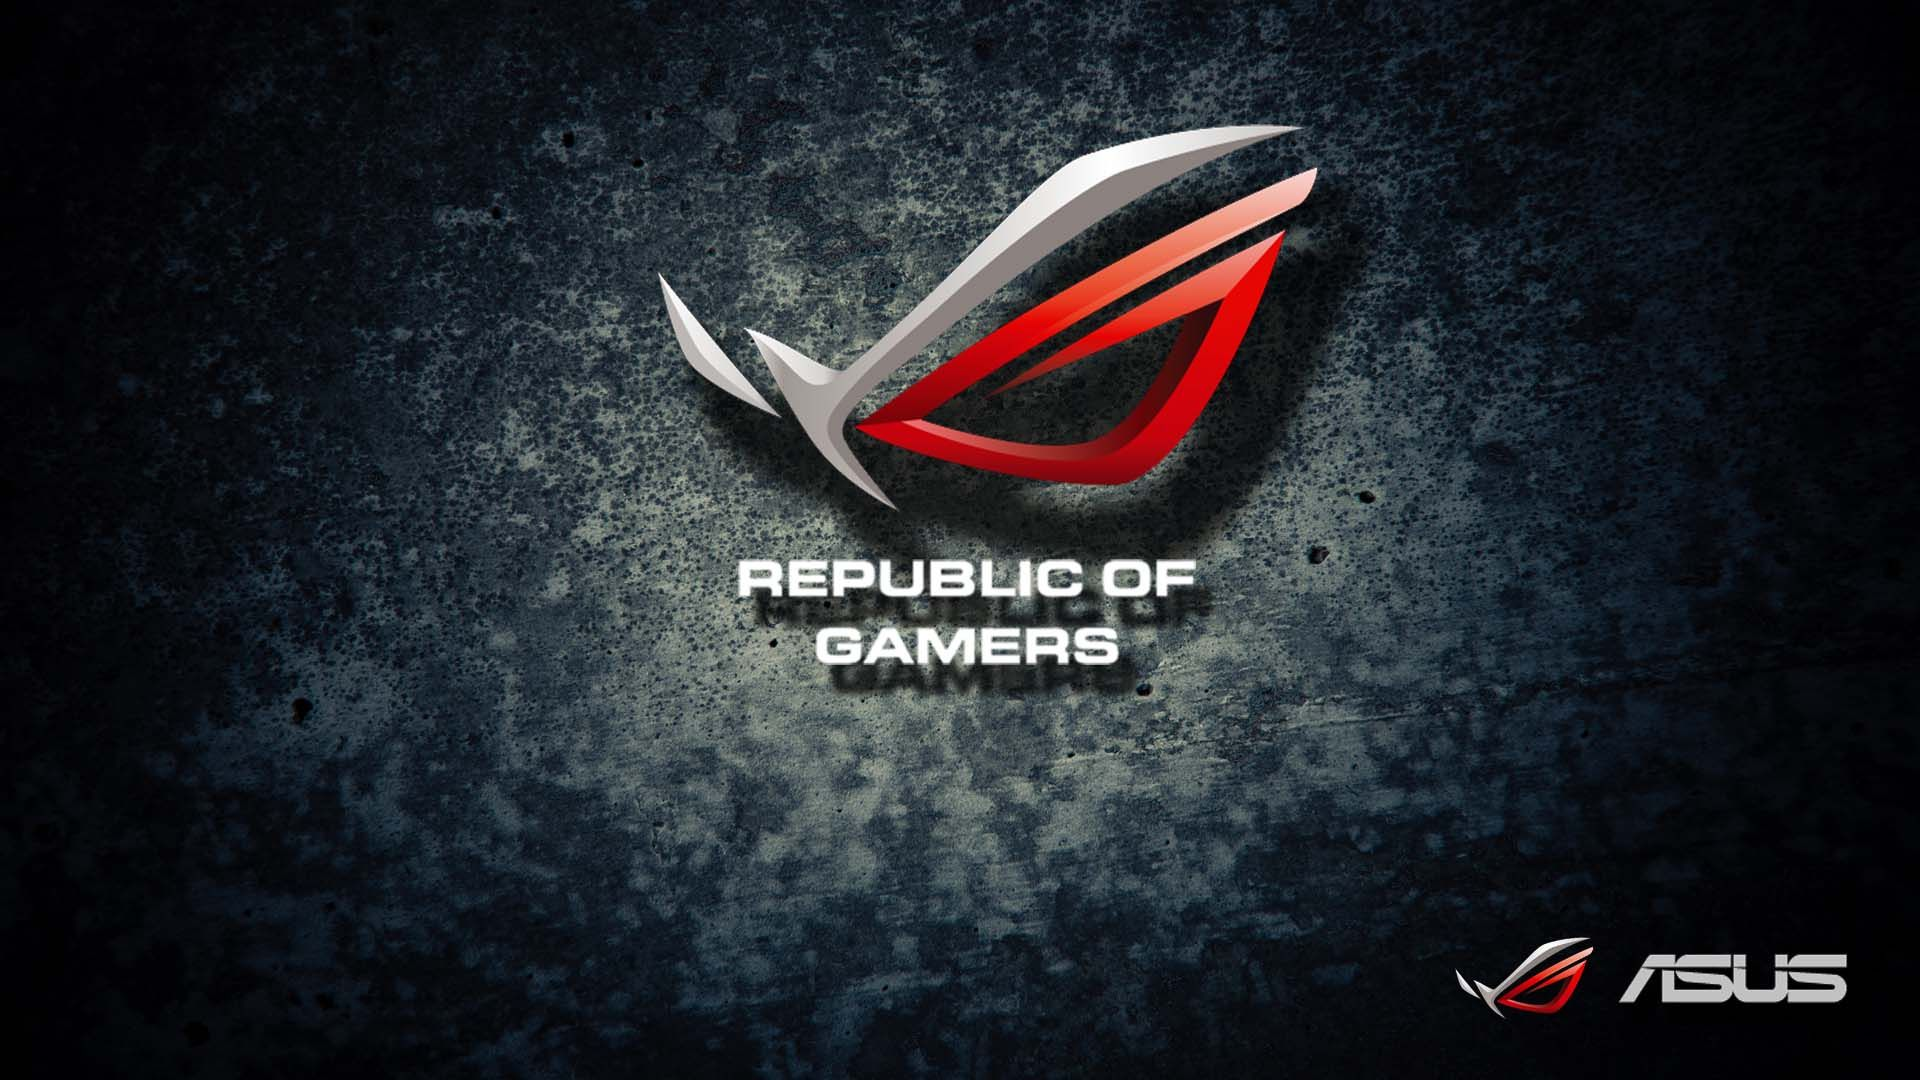 Republic of Gamers 4K Wallpapers - Top Free Republic of ...